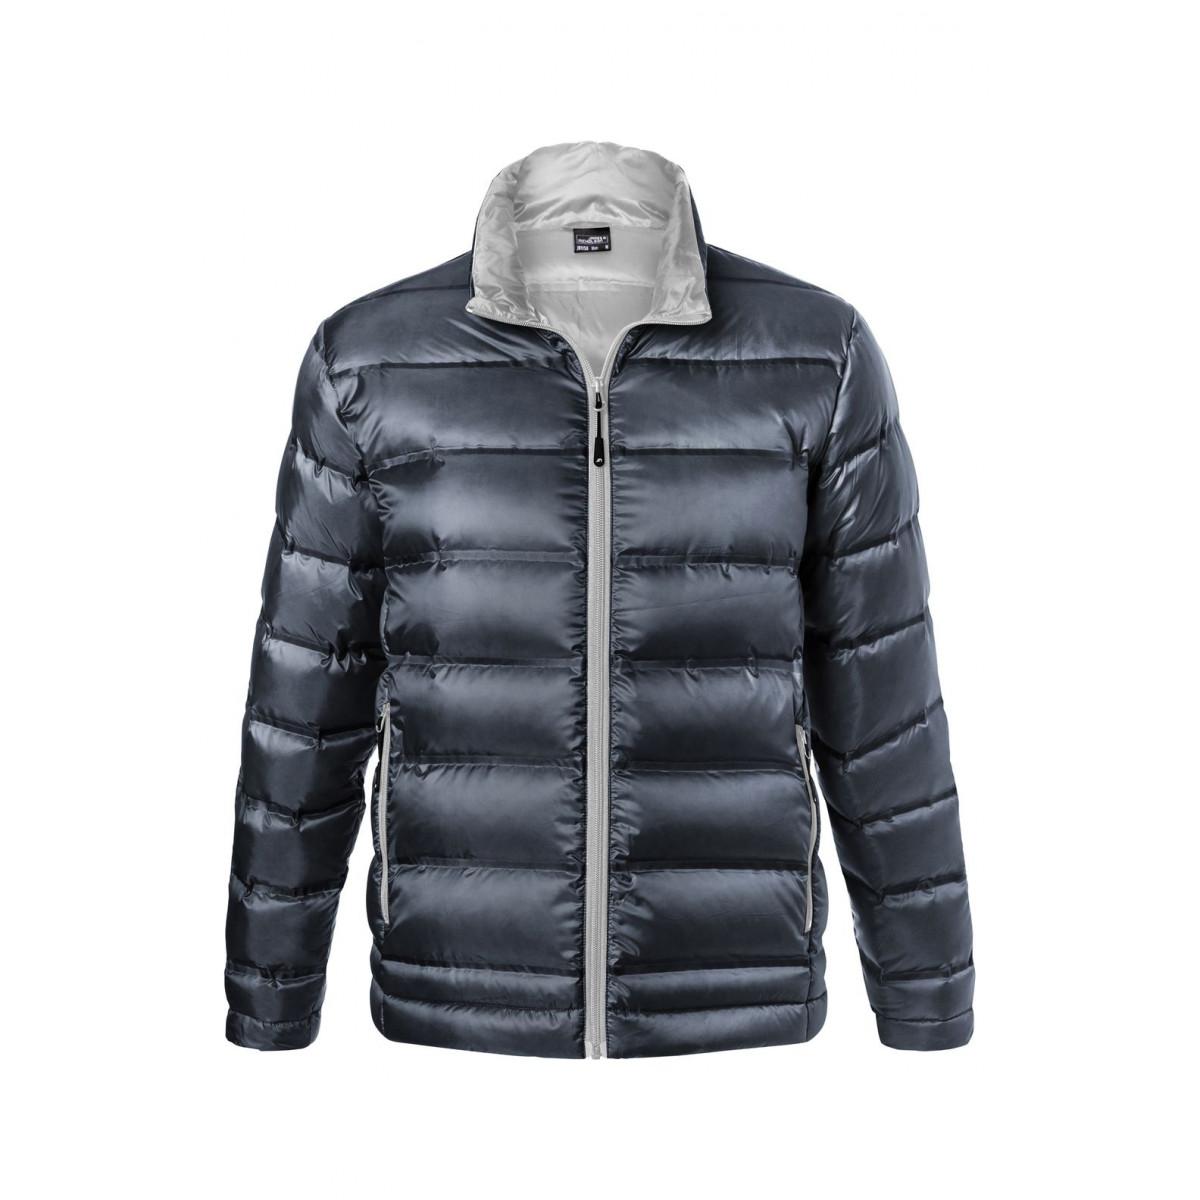 Куртка мужская JN1150 Mens Down Jacket - Темно-синий/Серебряный